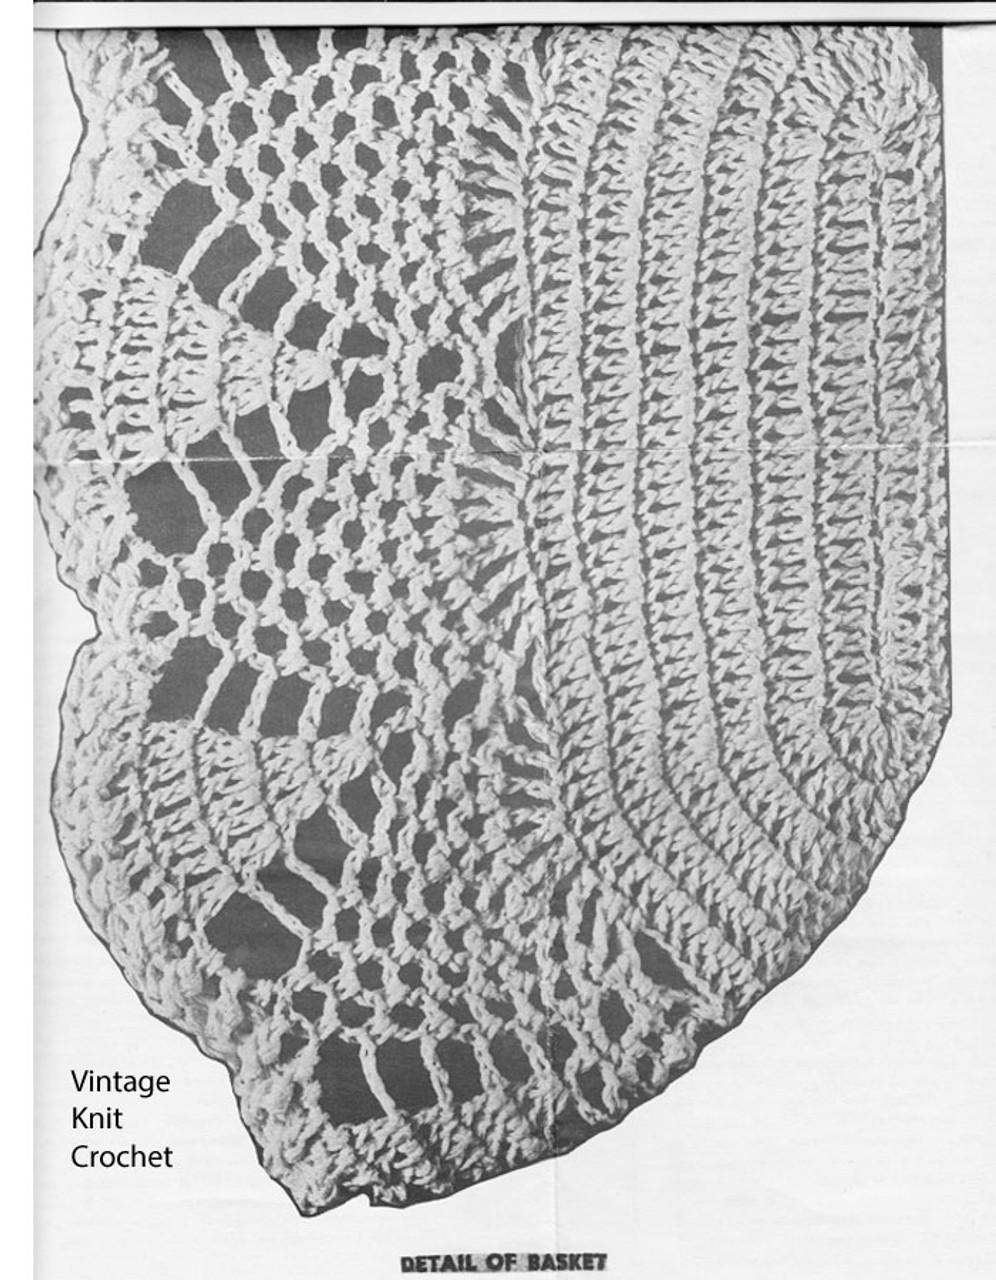 Oblong Crochet Basket Pattern Detail, Laura wheeler 798